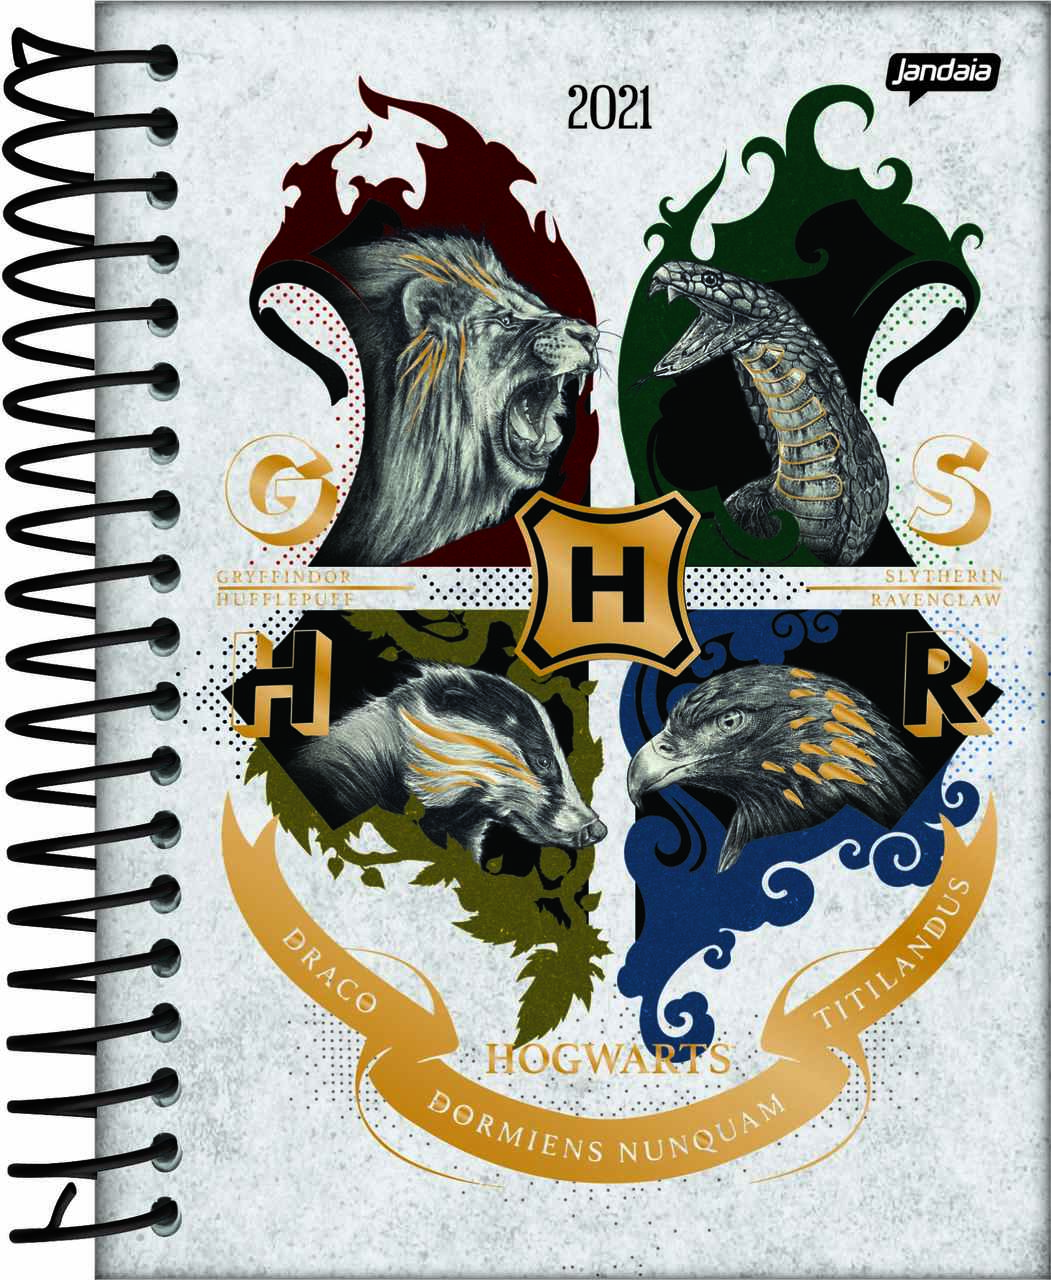 Agenda Diária Geek Emblema Hogwarts: Harry Potter - 352 Folhas - Jandaia